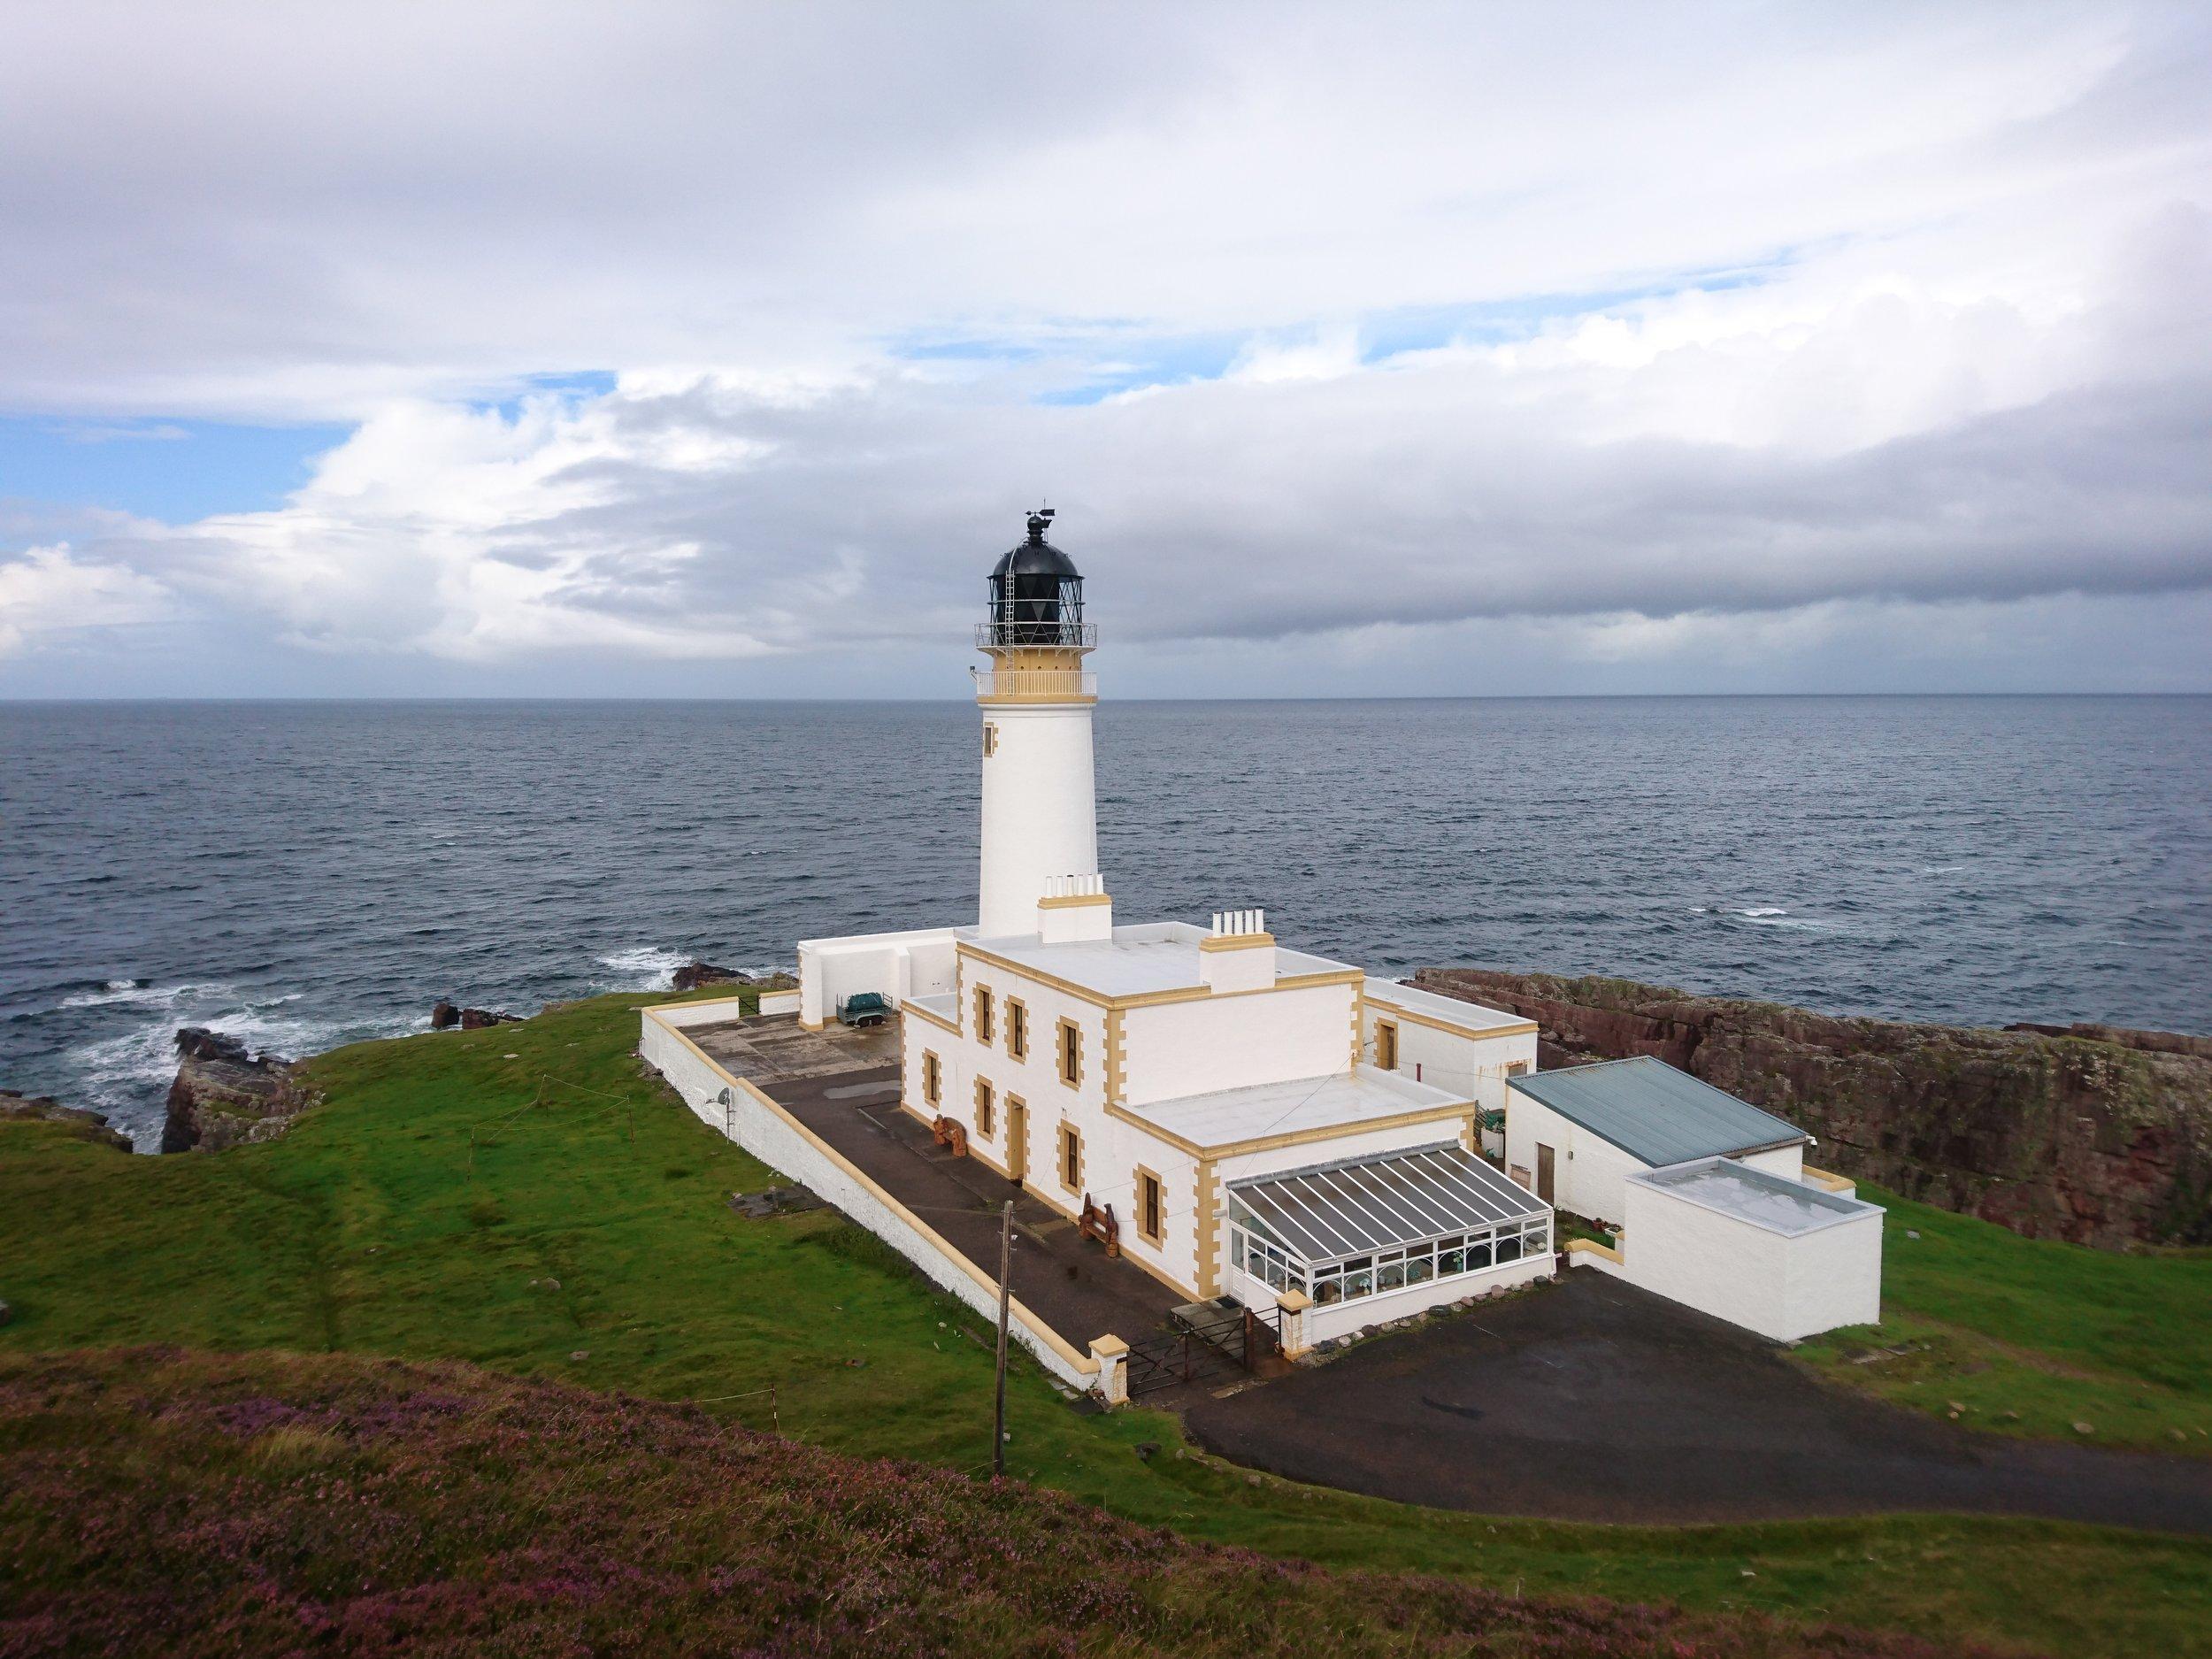 Rubha Rheid Lighthouse